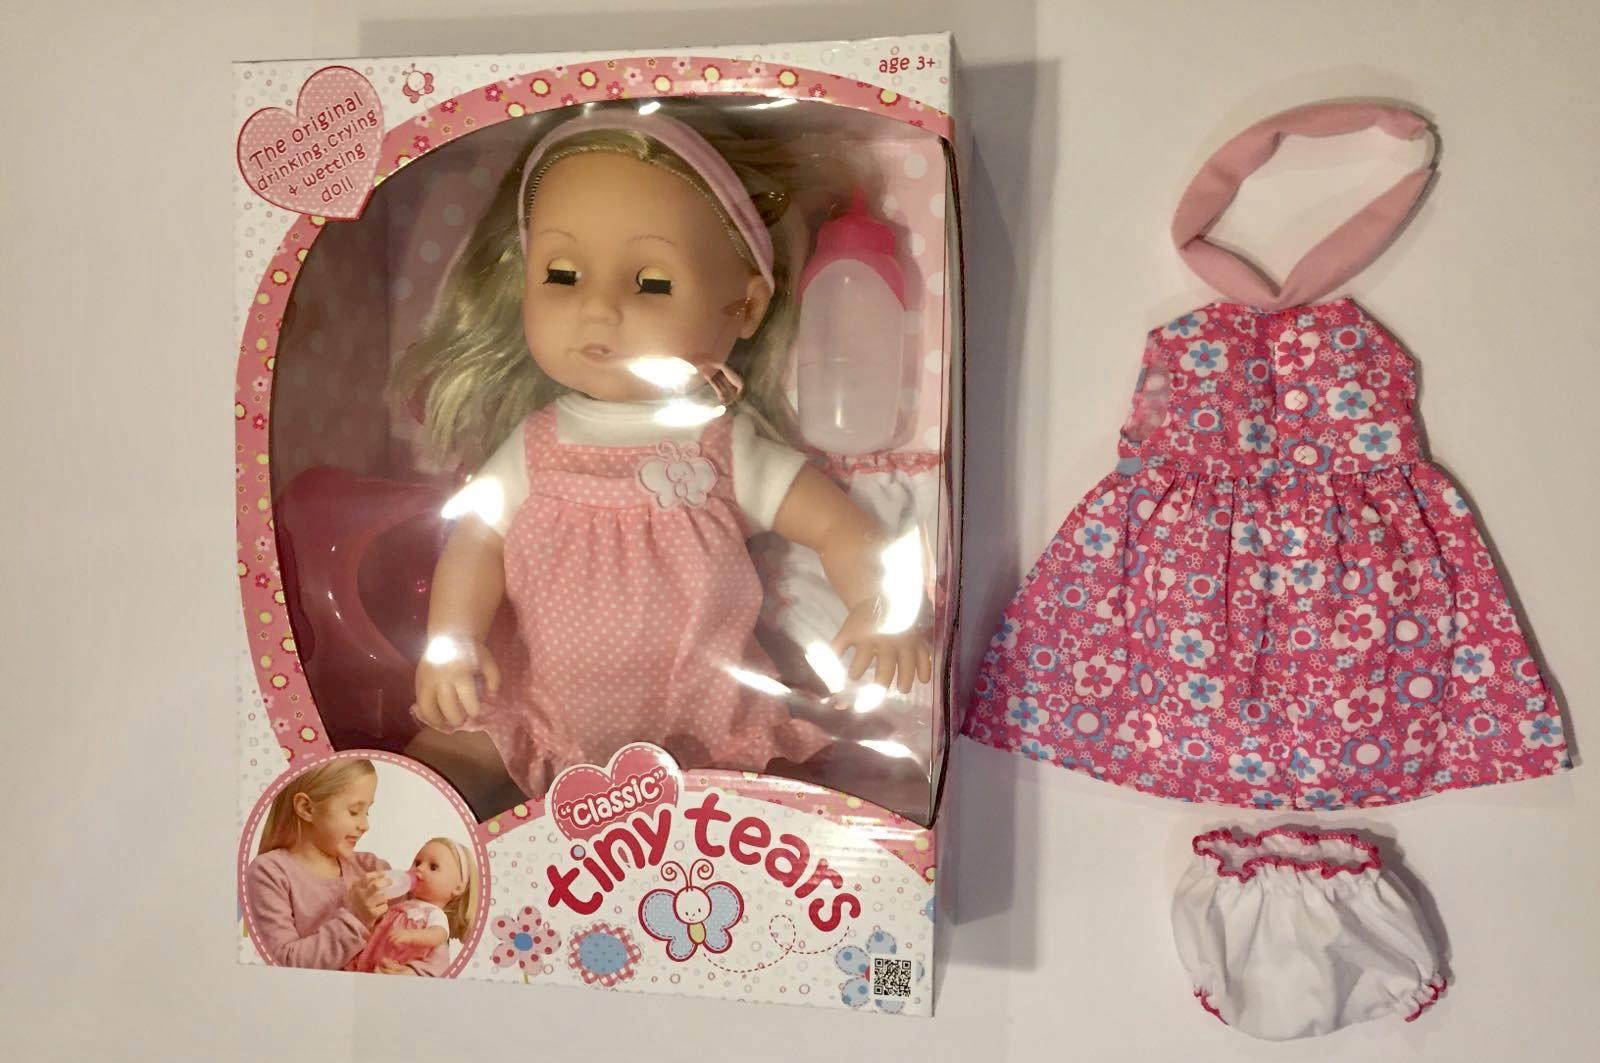 12ad1f3fffaa Classic Tiny Tears Doll has had a Makeover